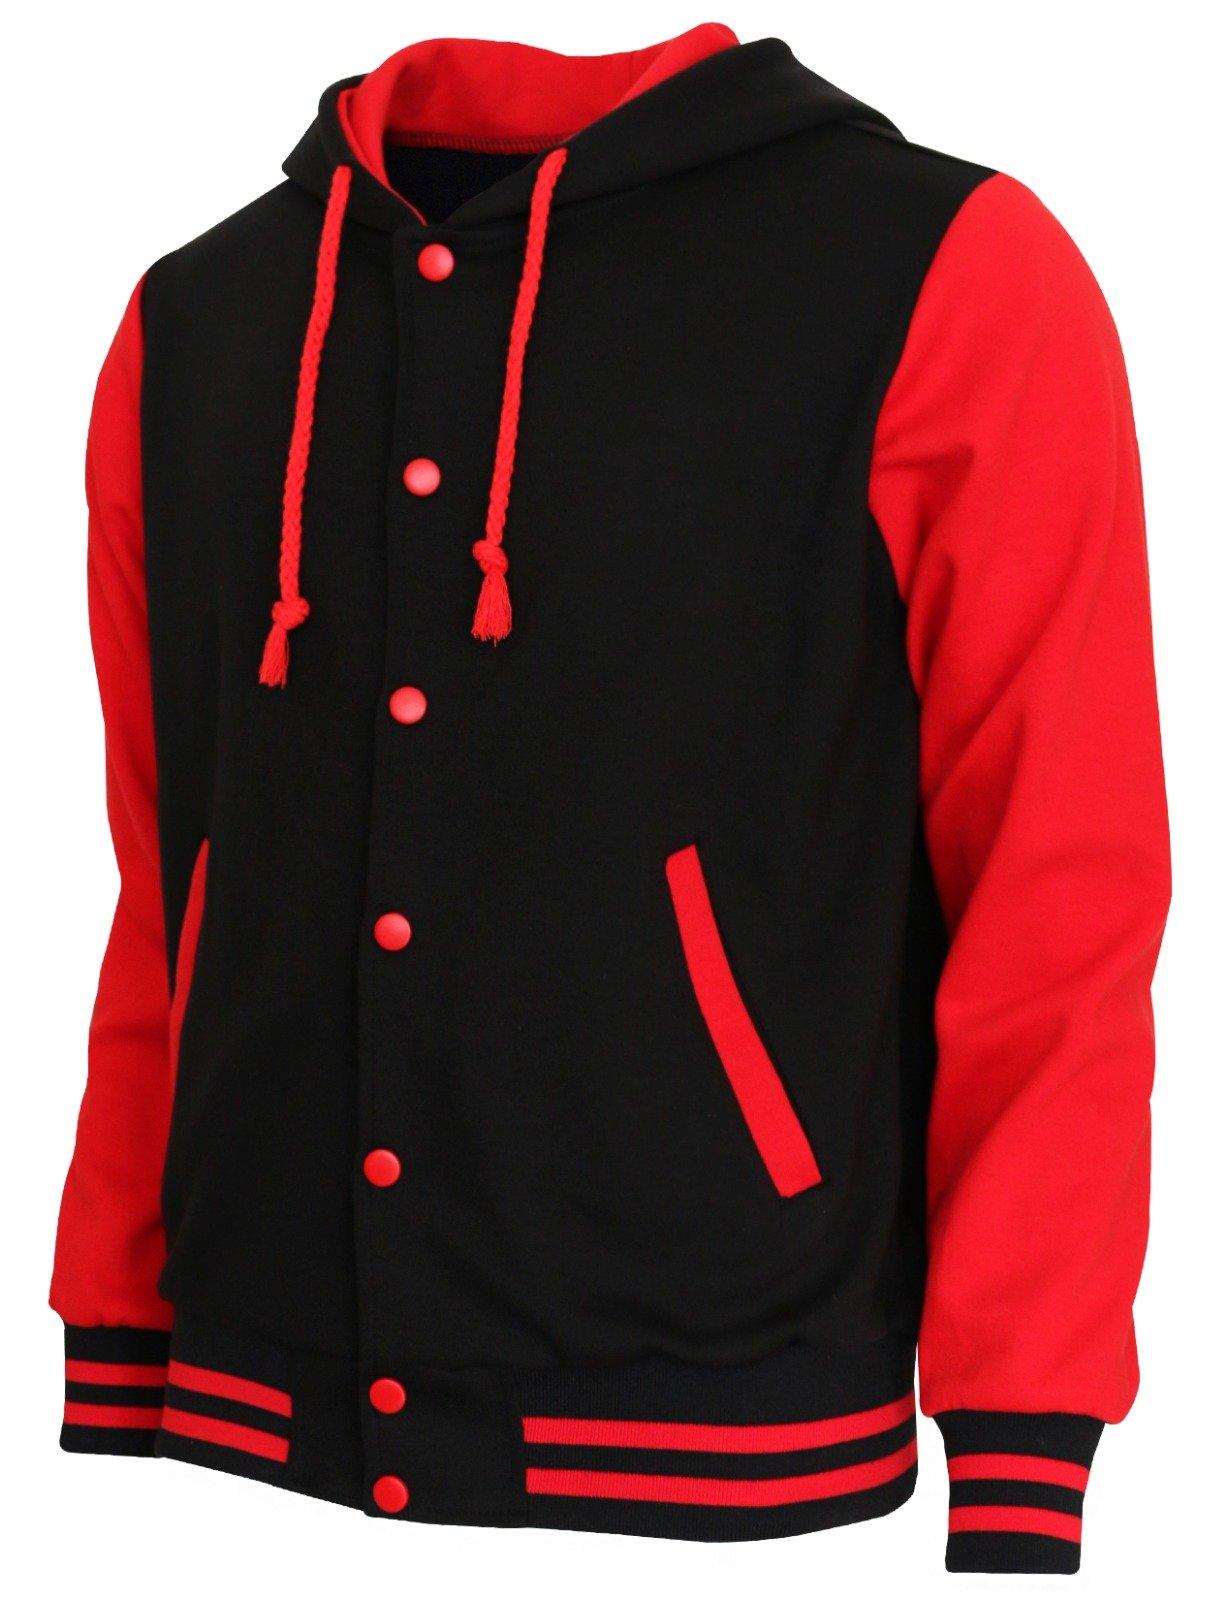 BCPOLO Hoodie Baseball Jacket Varsity Baseball Jacket Cotton Letterman Jacket Black-Red-S by BCPOLO